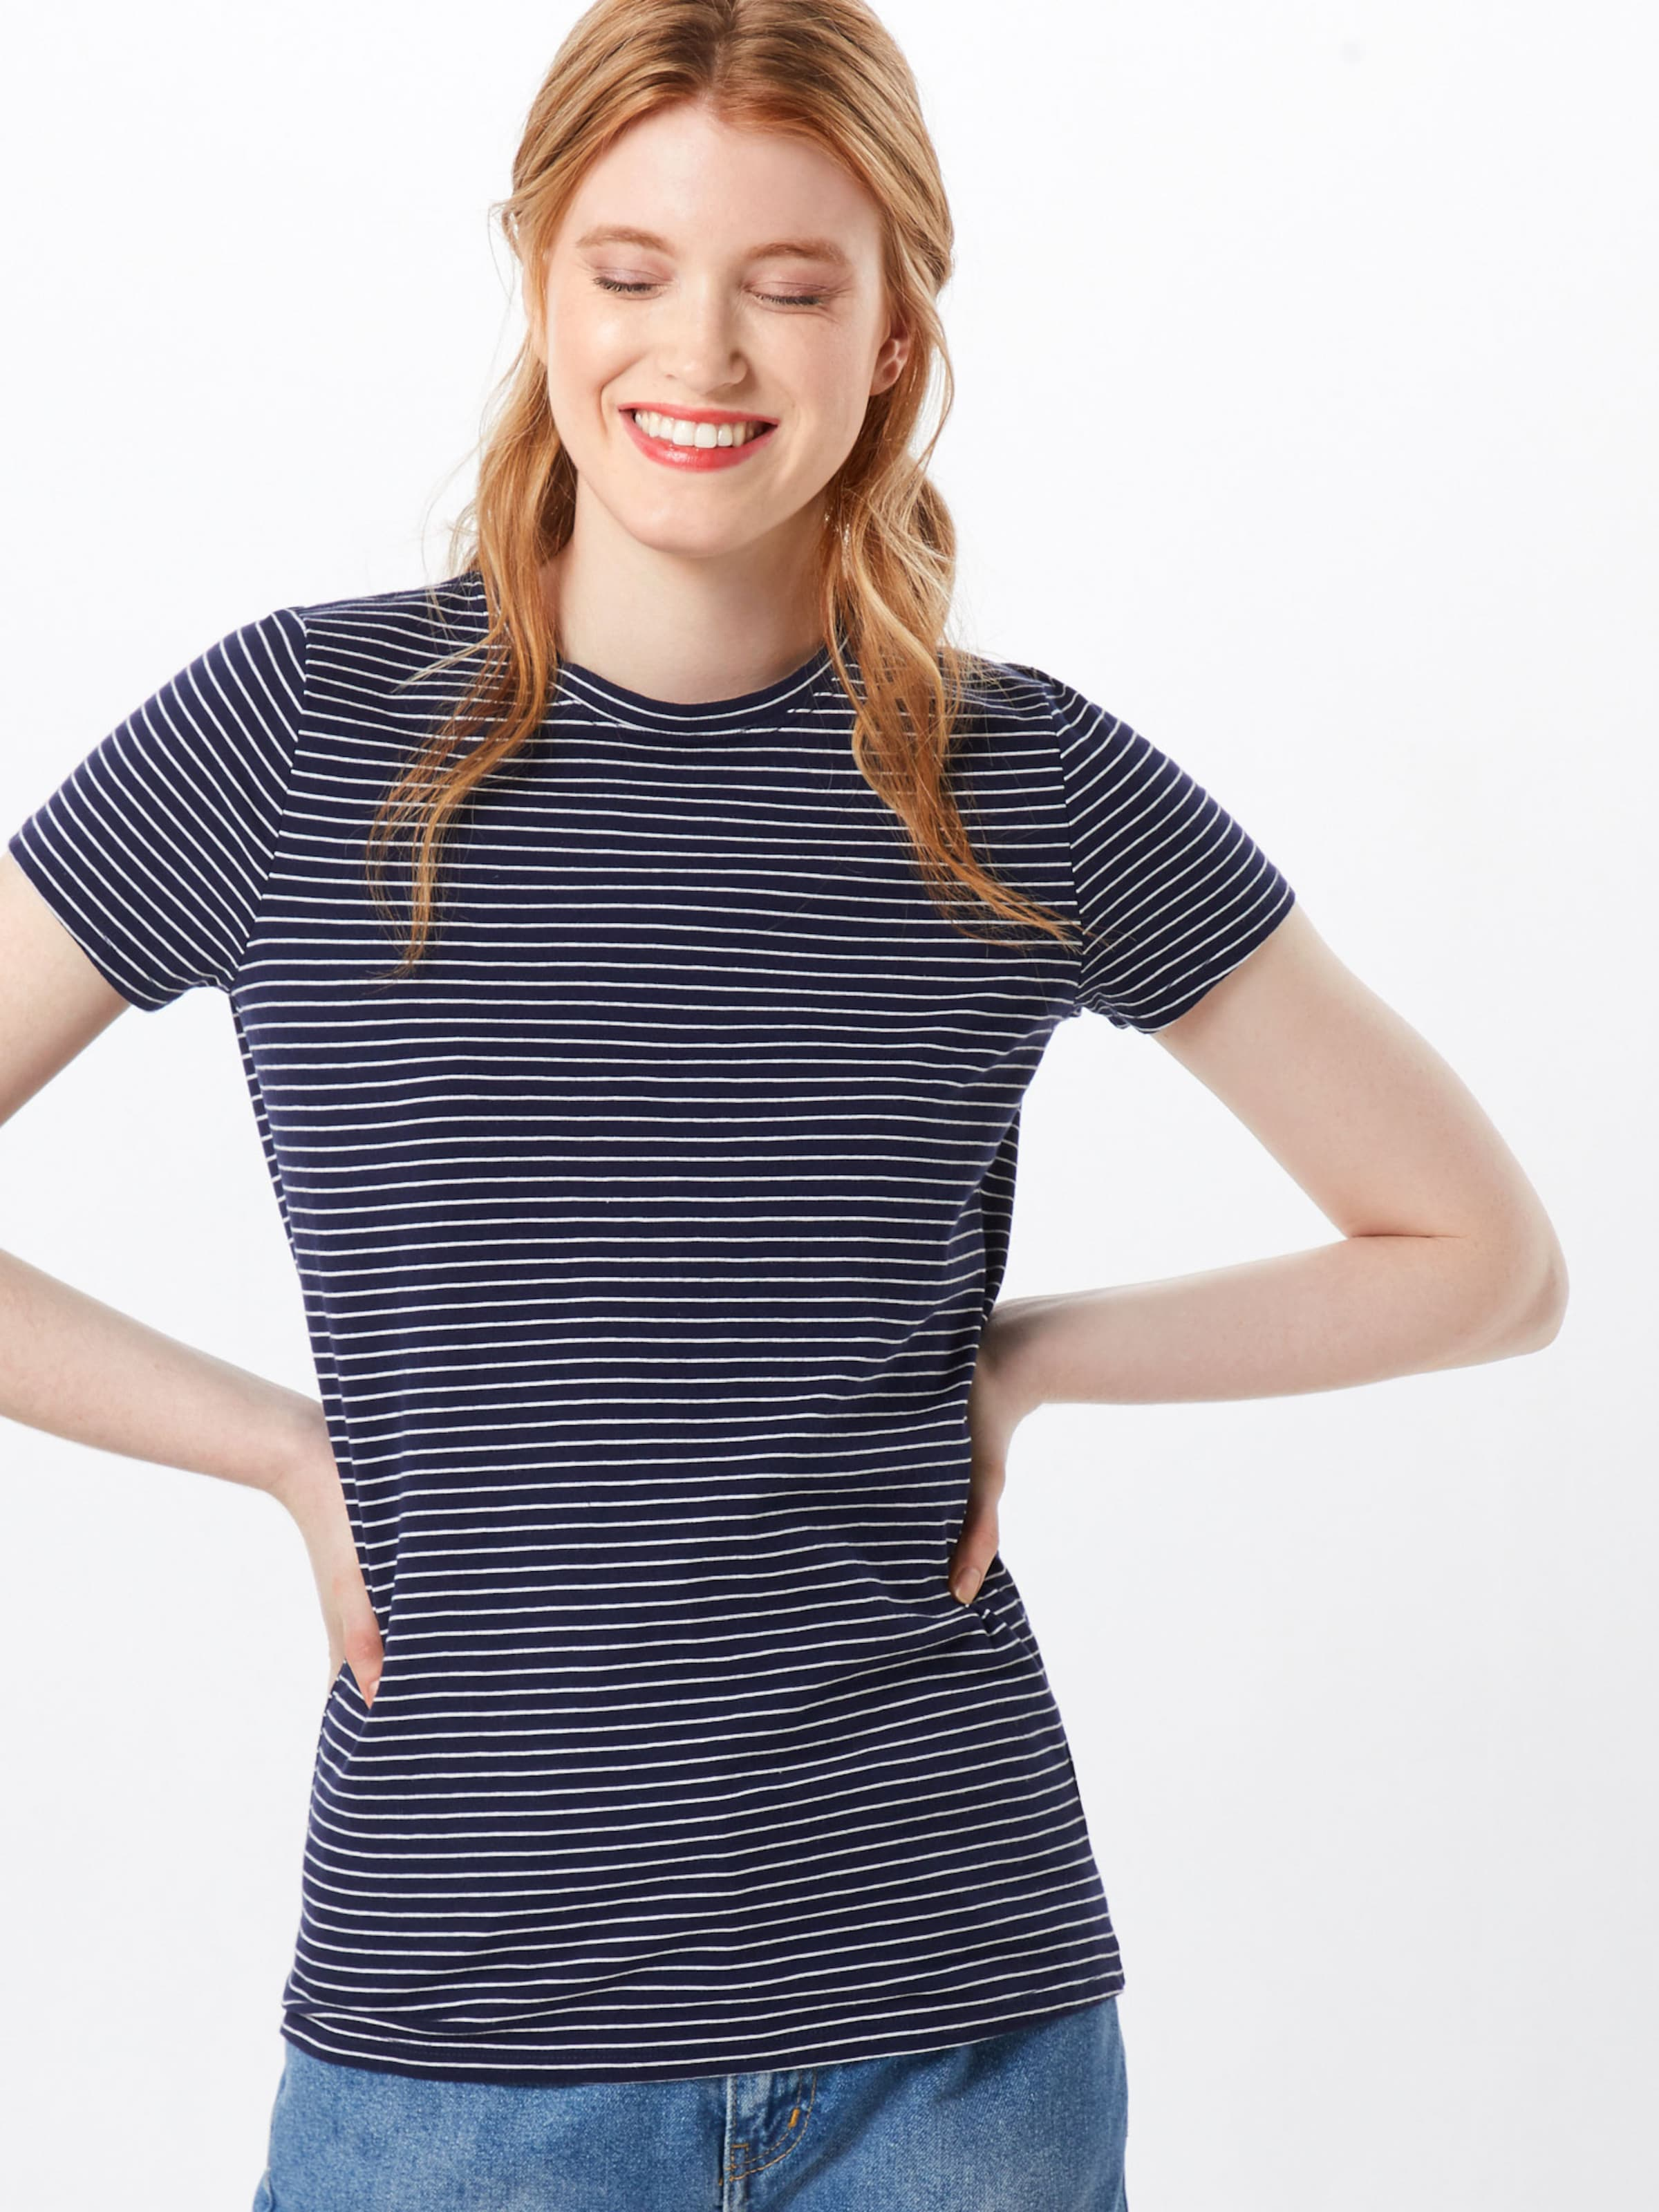 shirt MarineBlanc Bleu Gap En T VUjSMLzGqp